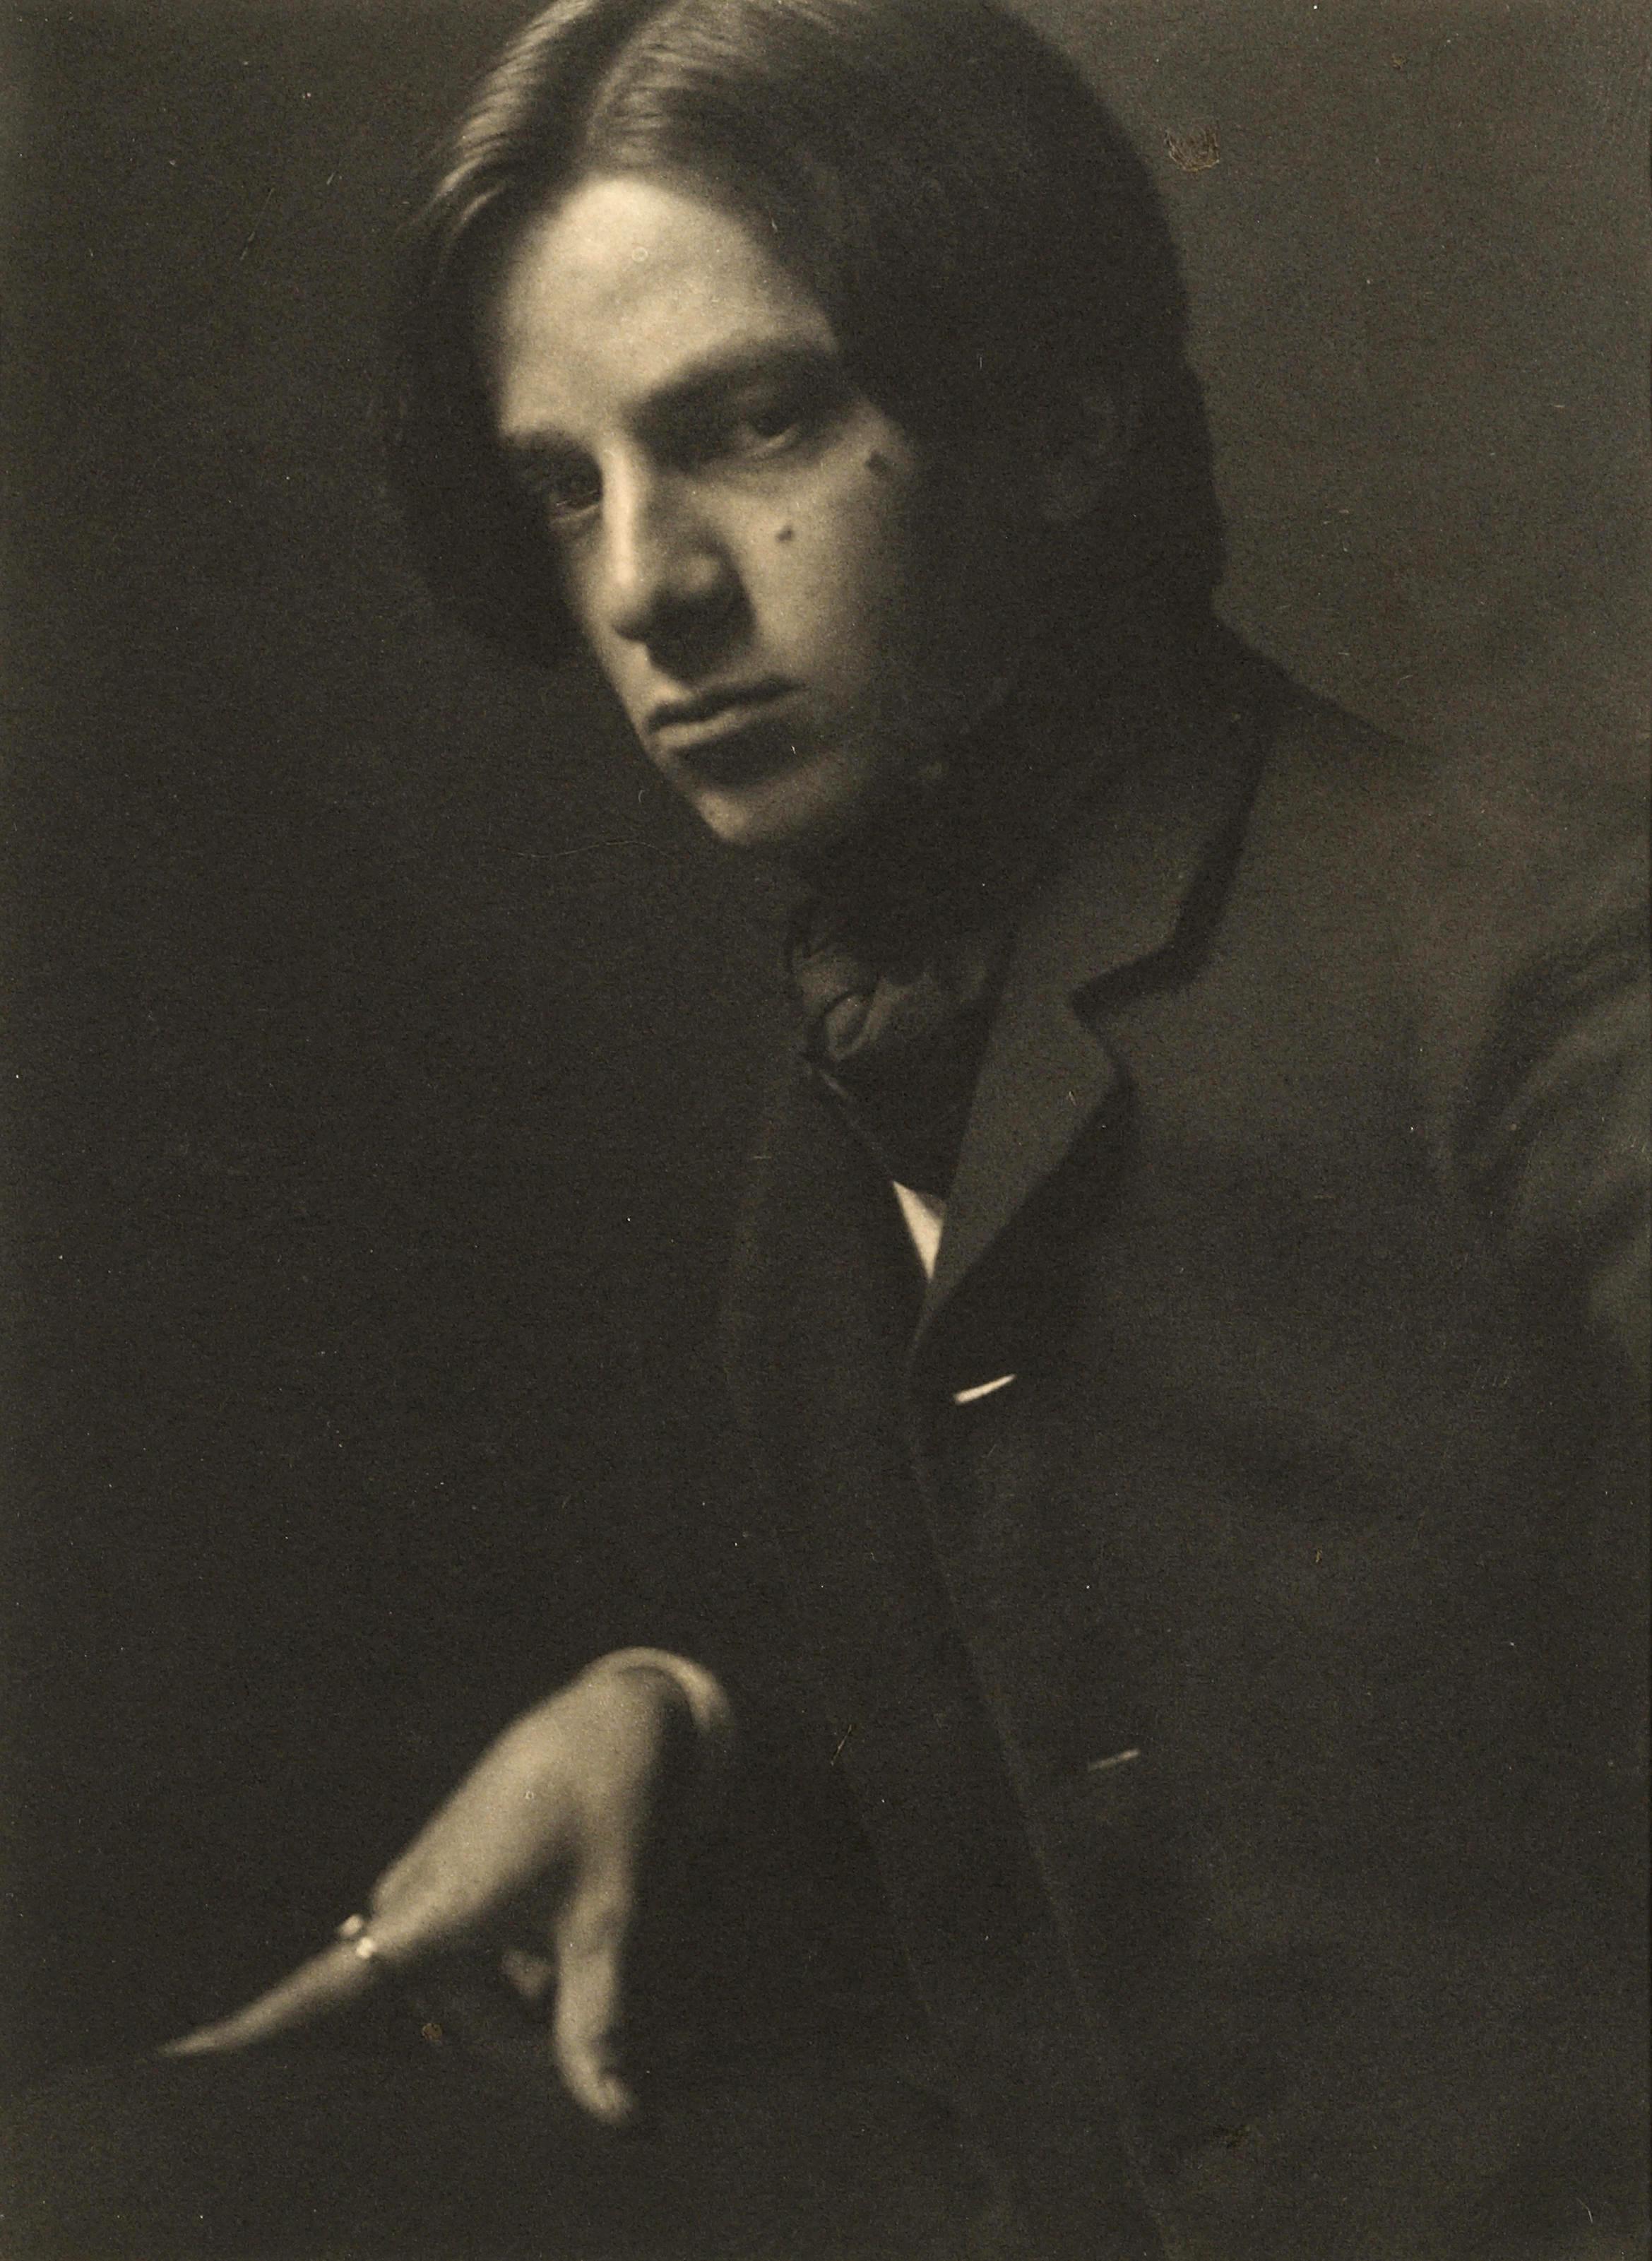 https://upload.wikimedia.org/wikipedia/commons/4/49/Alvin_Langdon_Coburn_self-portrait%2C_1905.jpg